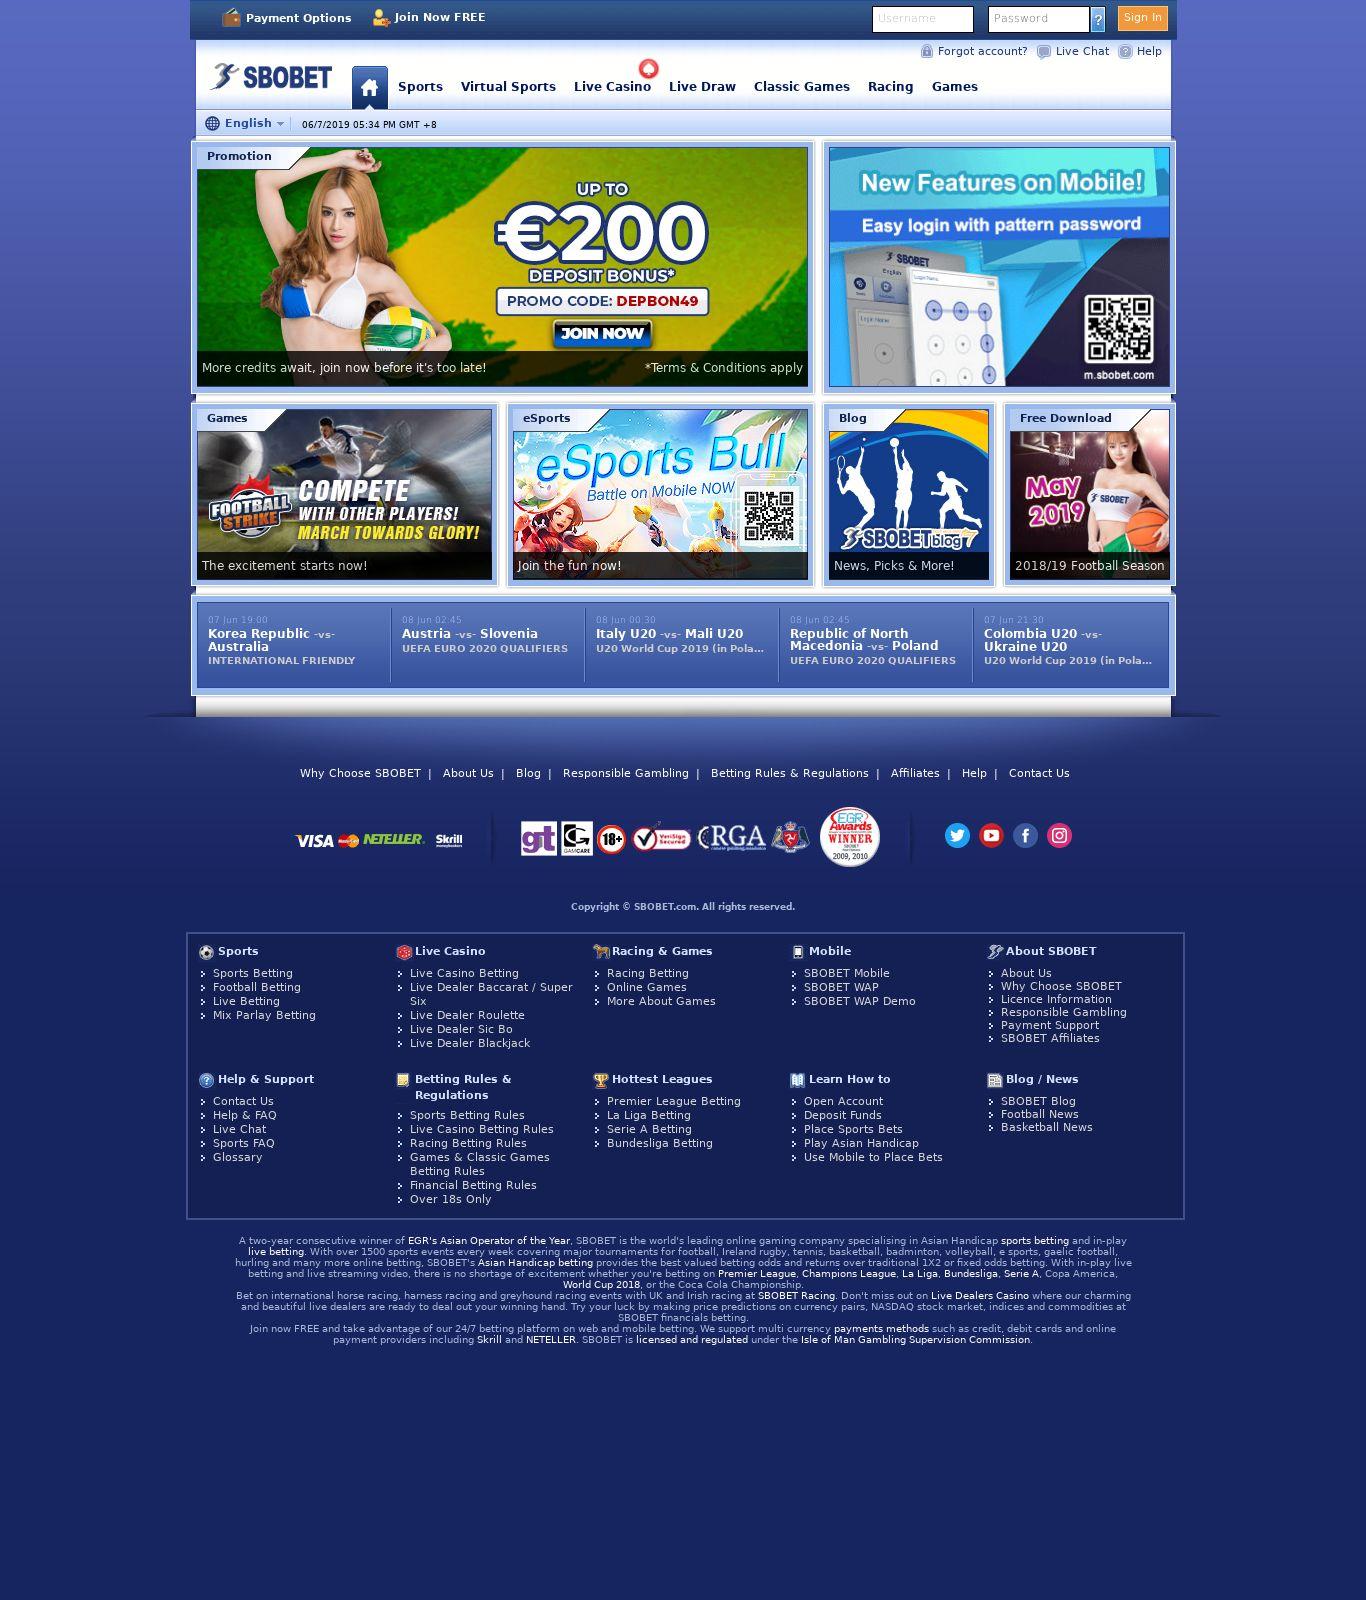 Sbo Bet Casino Review 2021 ᐈ Sbobet Casino Slot Games Sbobet Com Mobile App